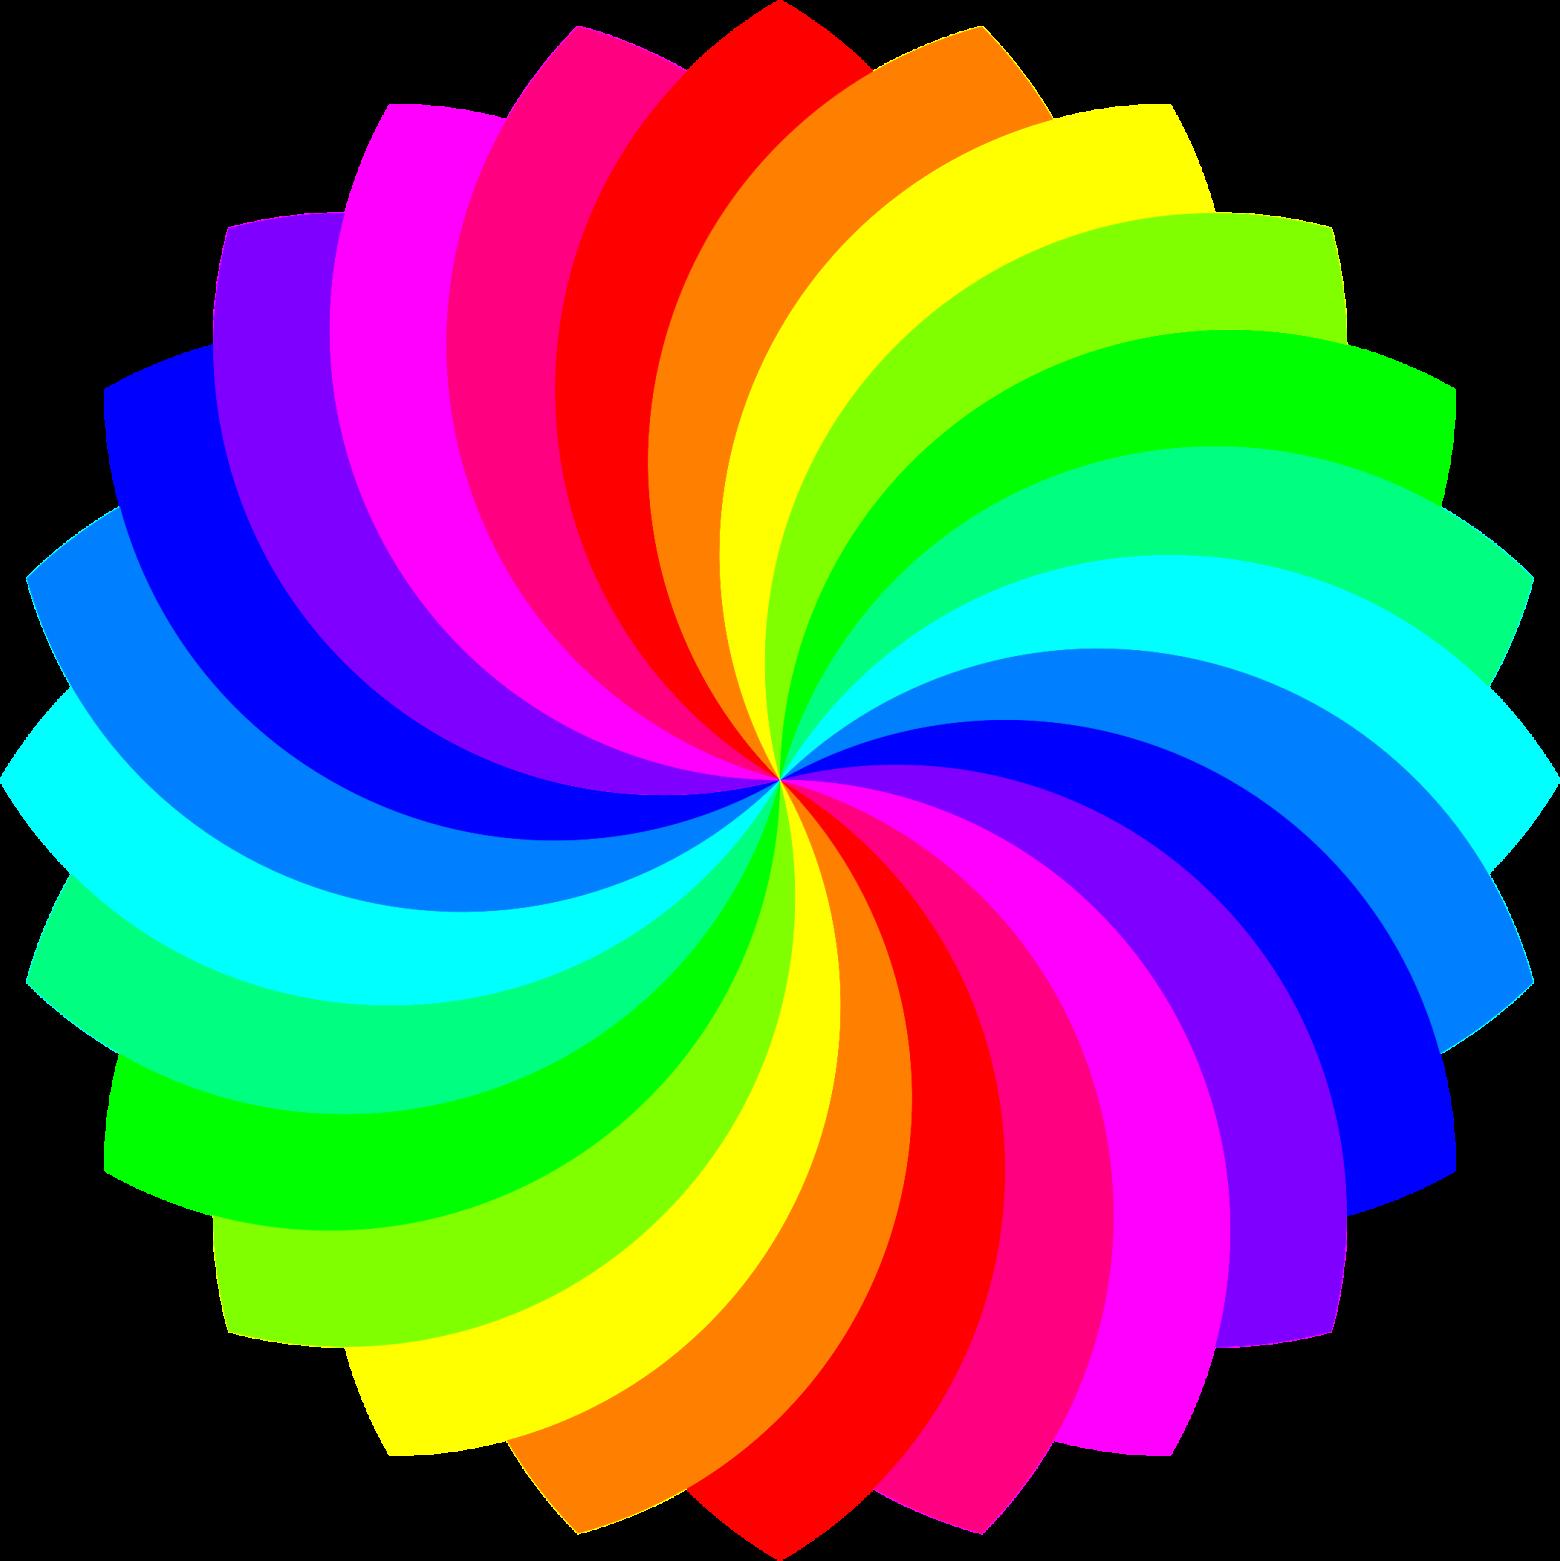 Sun& rainbow clipart free image download Свързано изображение   Transparent Decoration PNG Picture   Pinterest image download